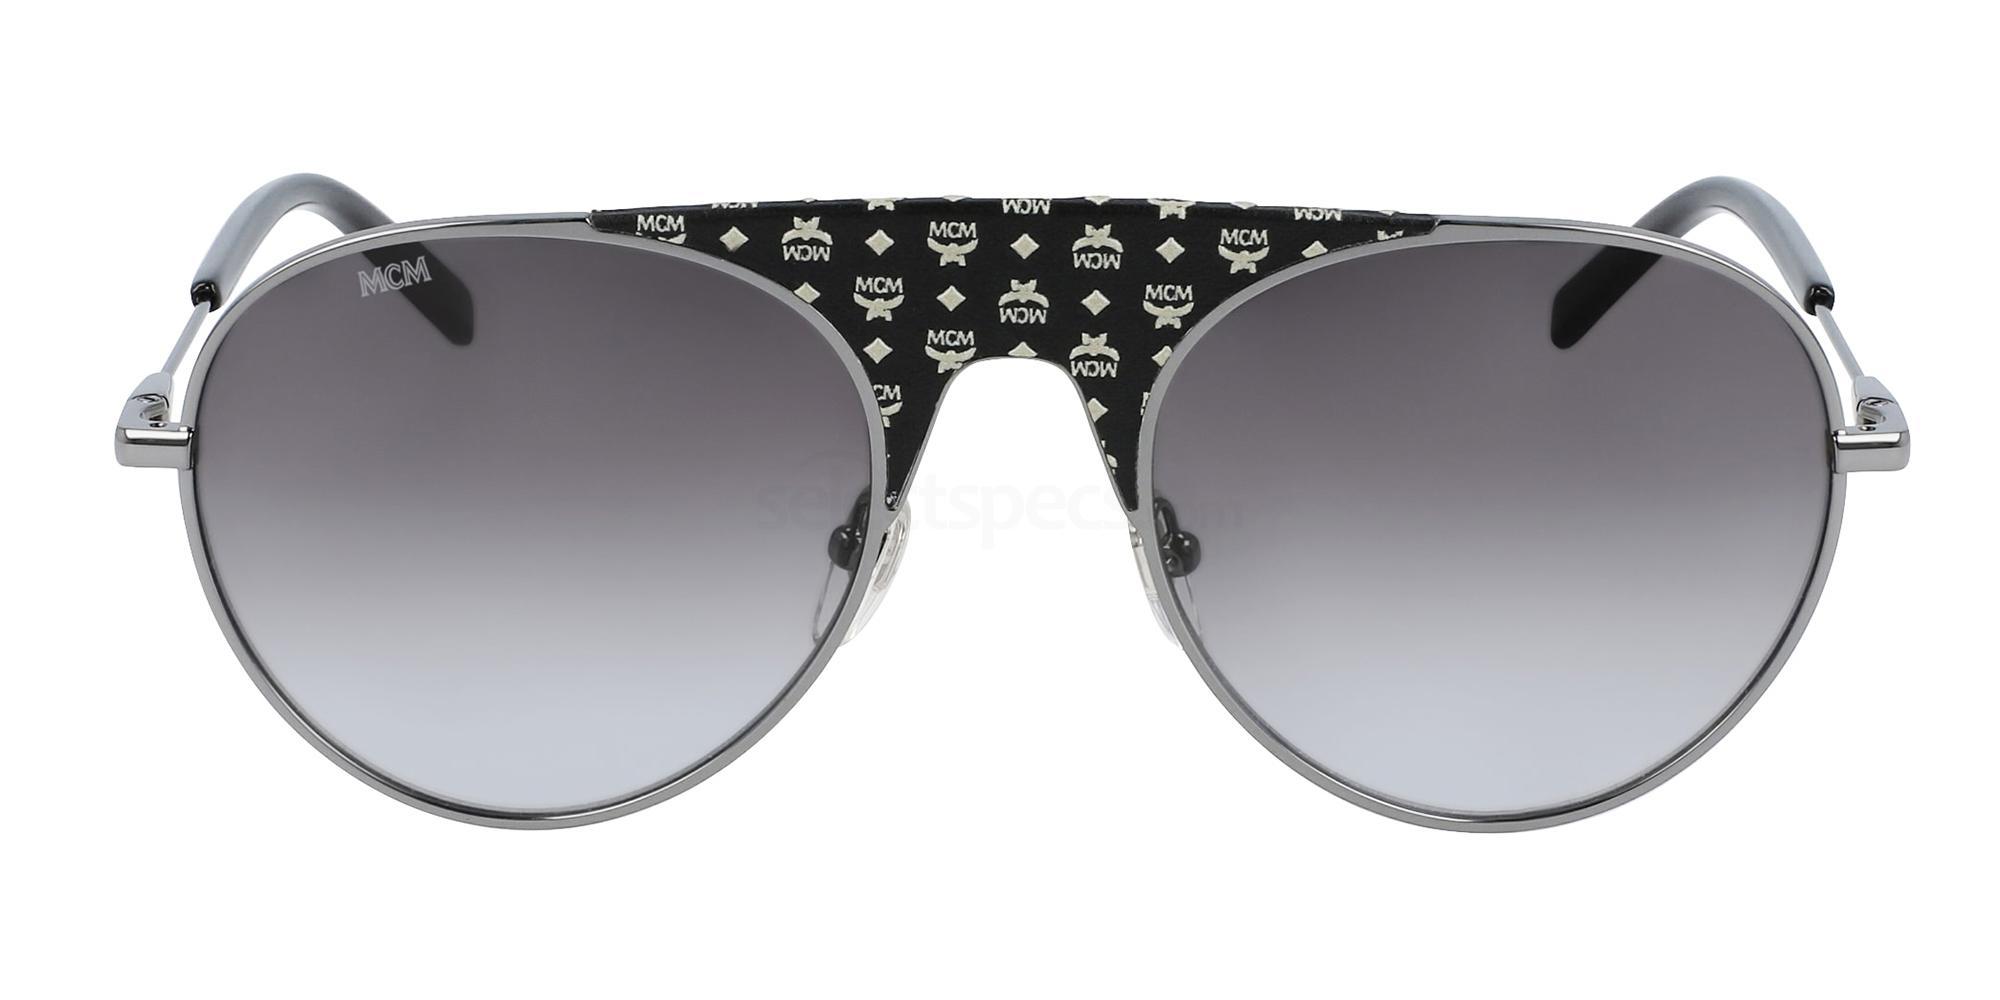 001 MCM150SL Sunglasses, MCM